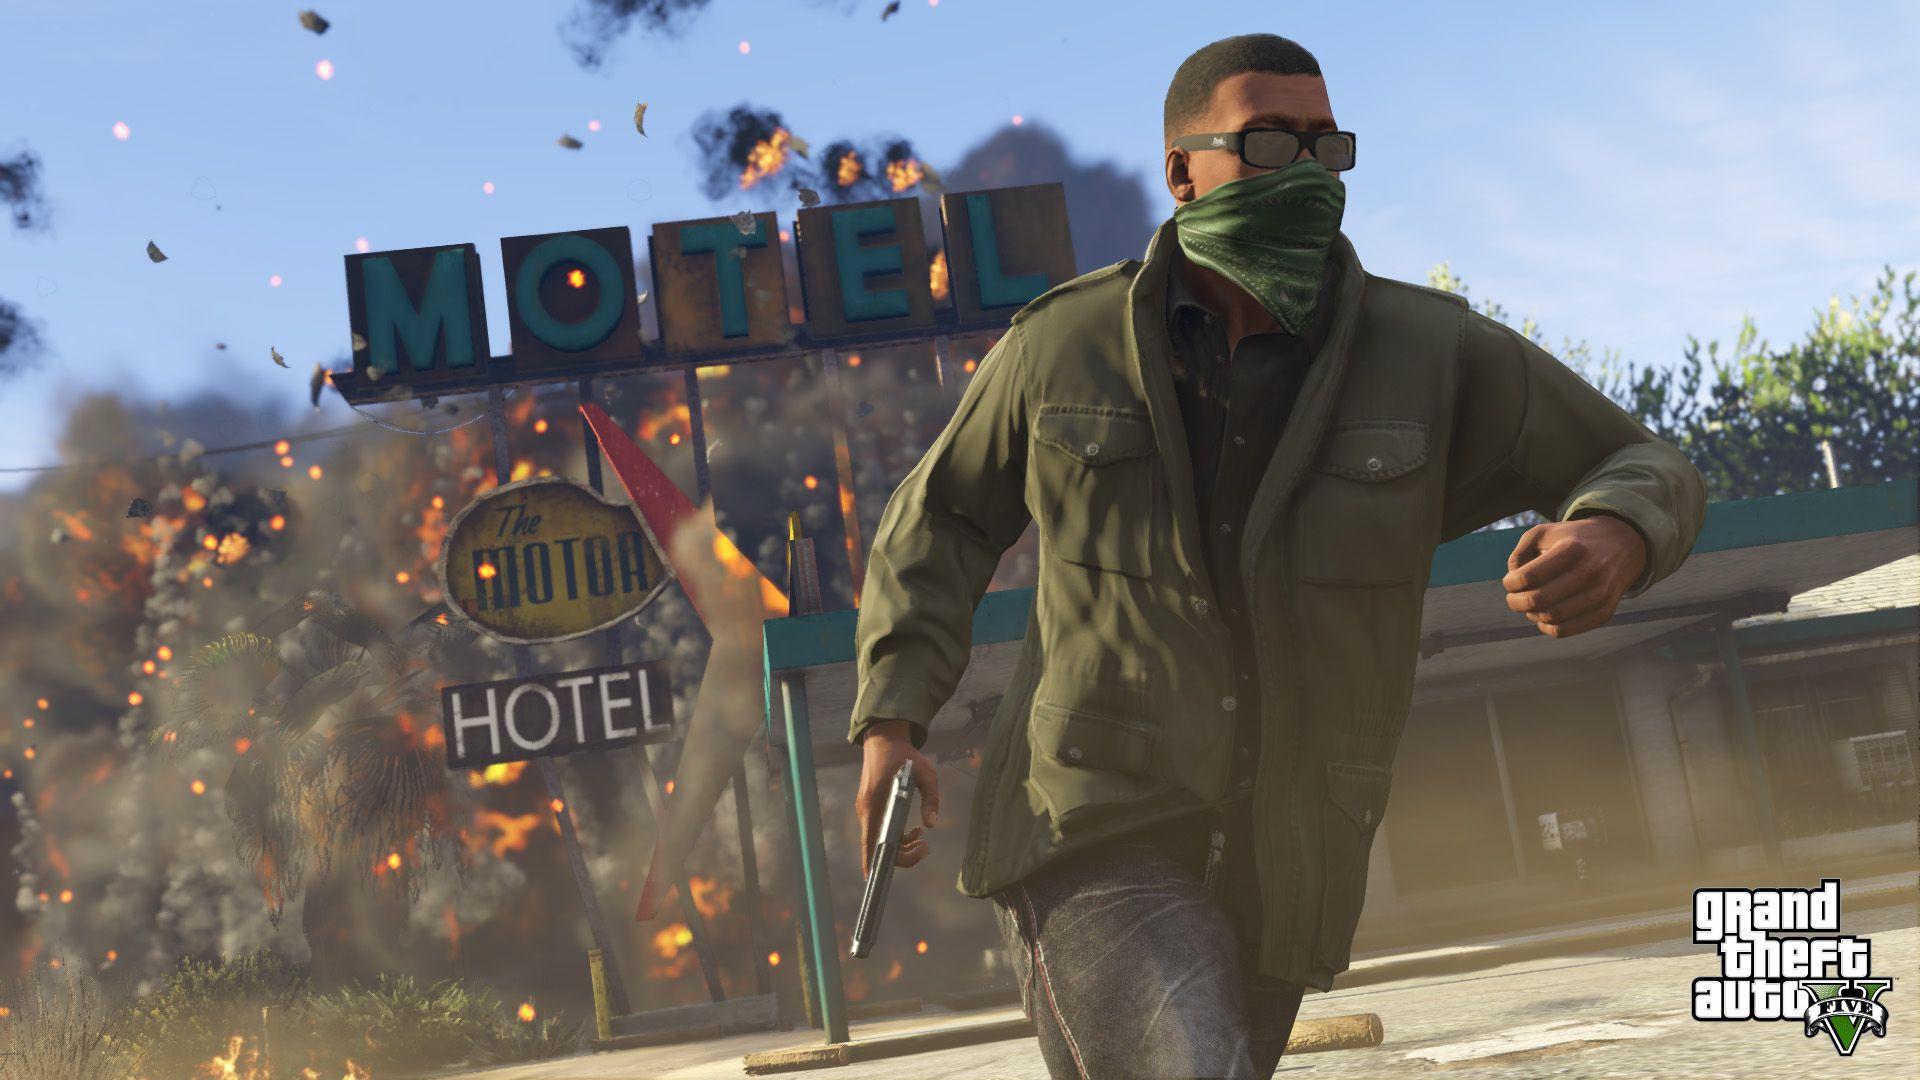 JBD GTA V Rockstar Games fline PC Game